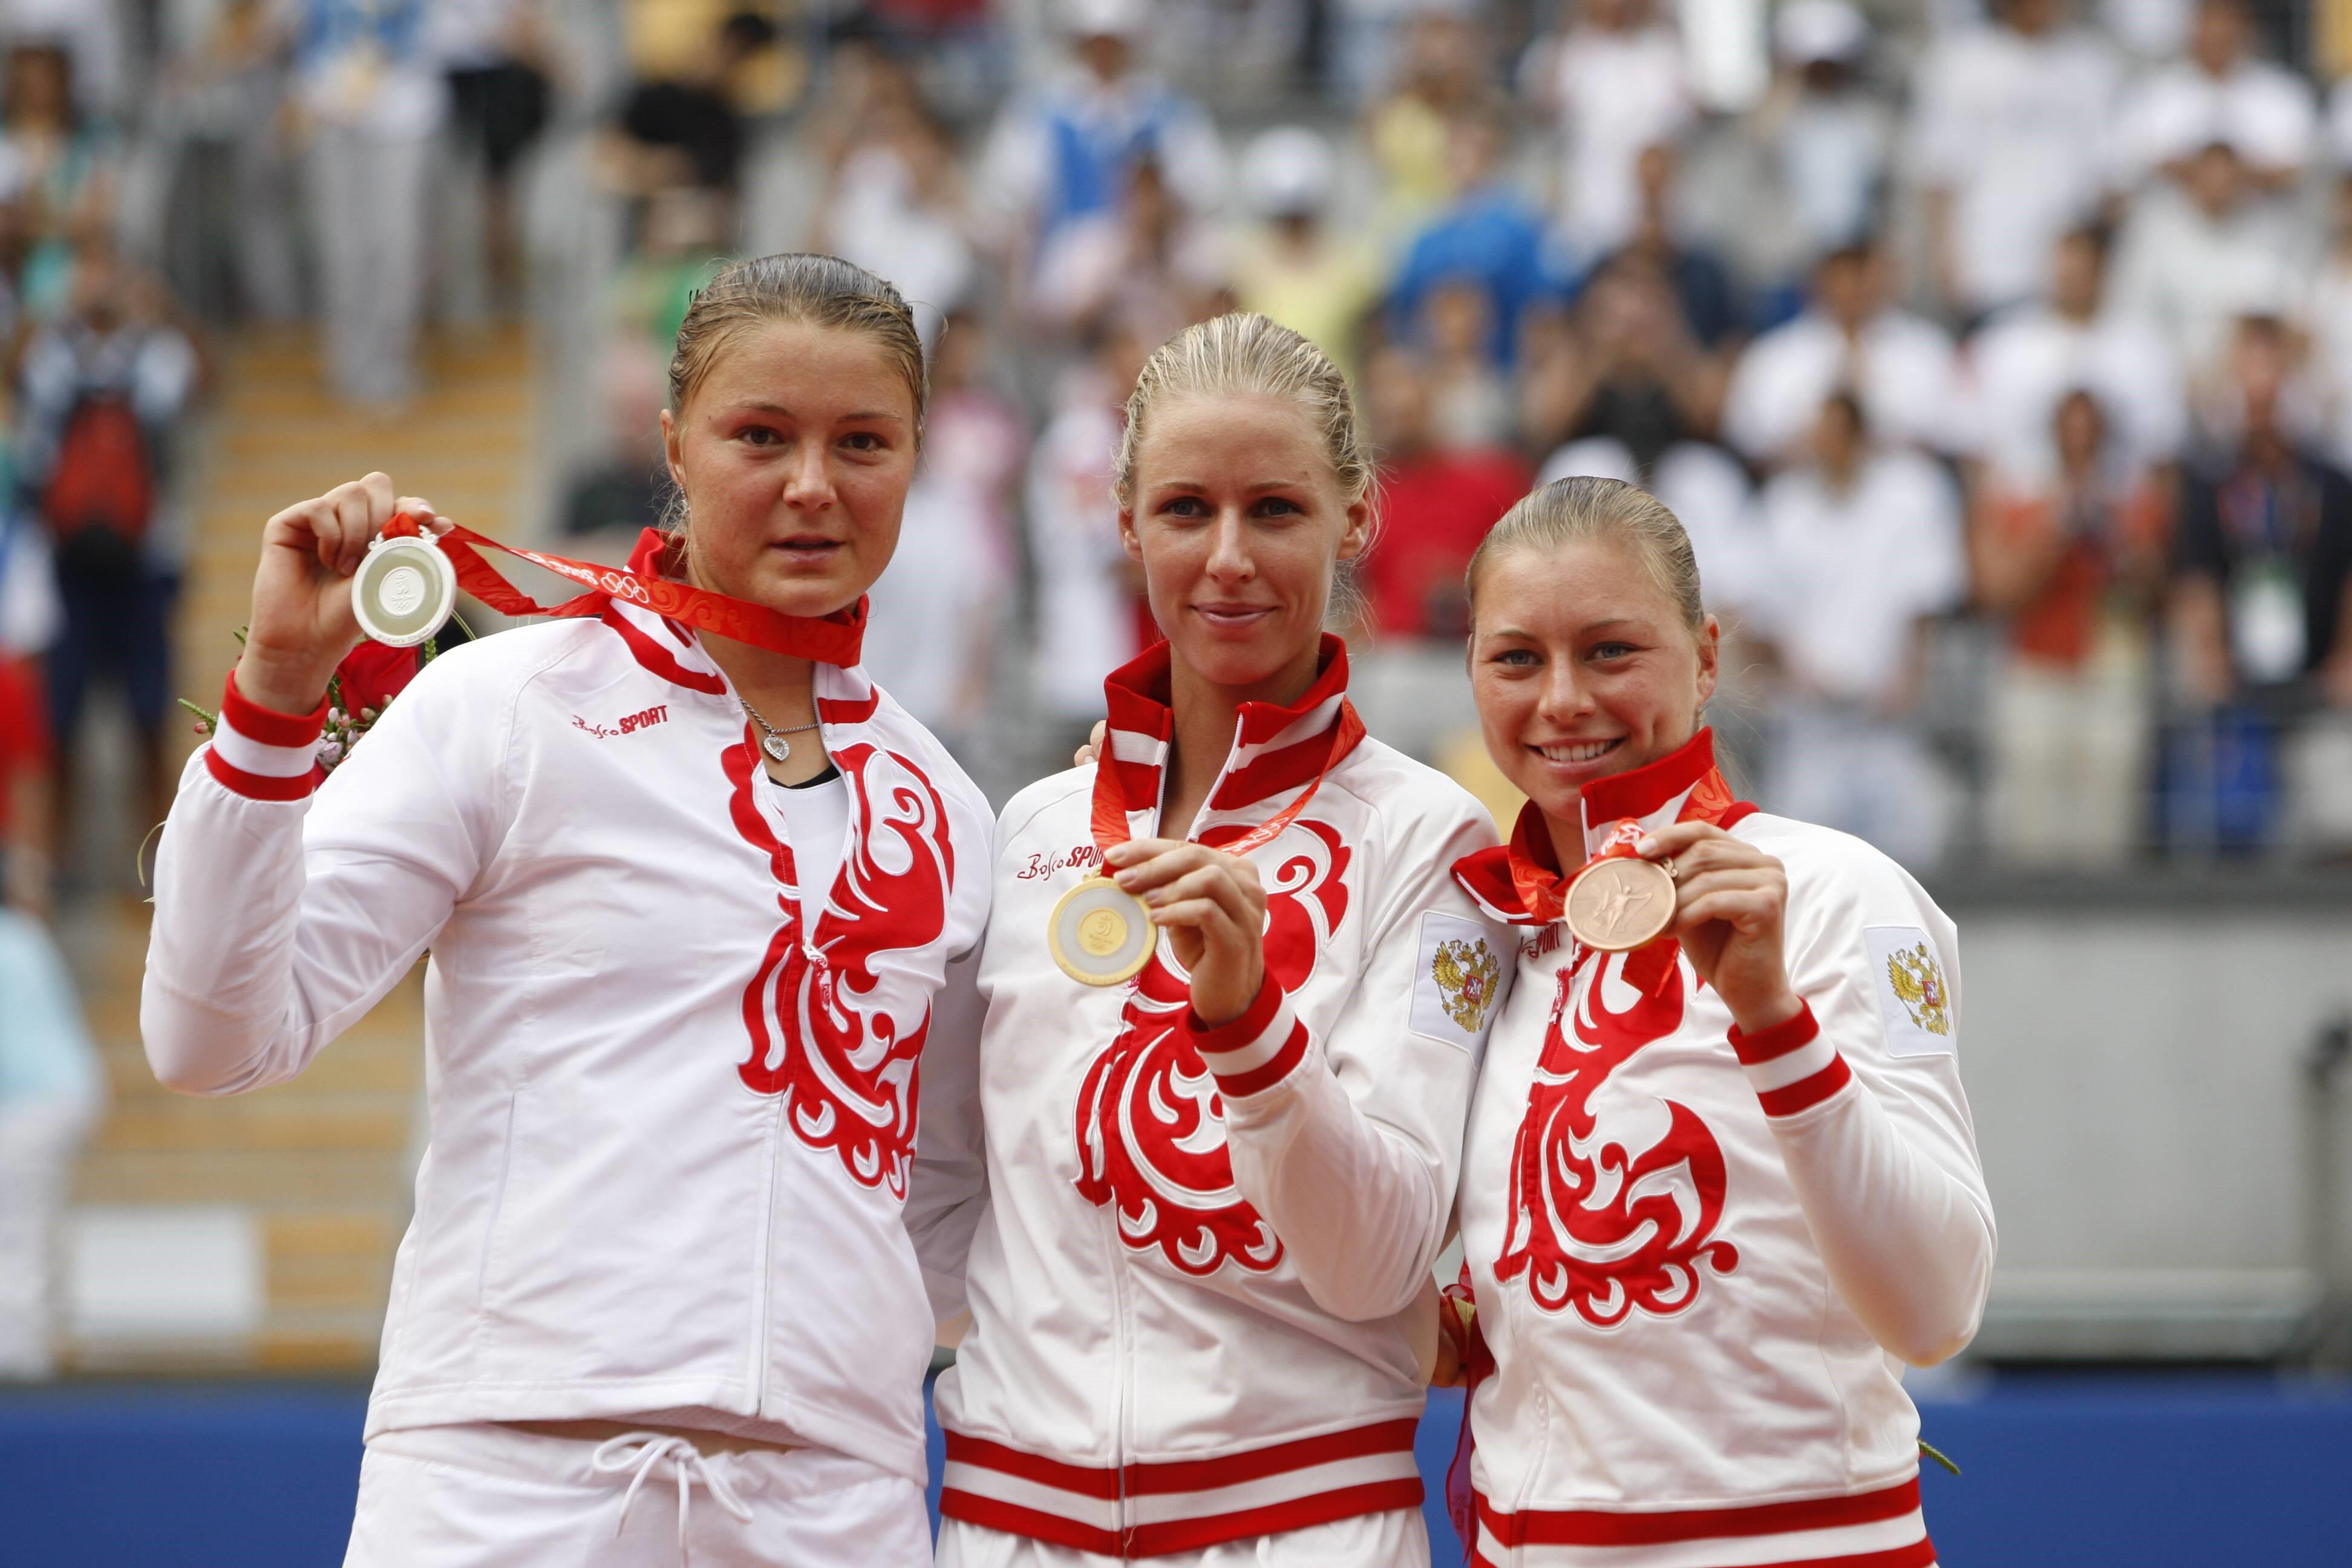 Динара Сафина, Елена Дементьева и Вера Звонарева. Пекин-2008